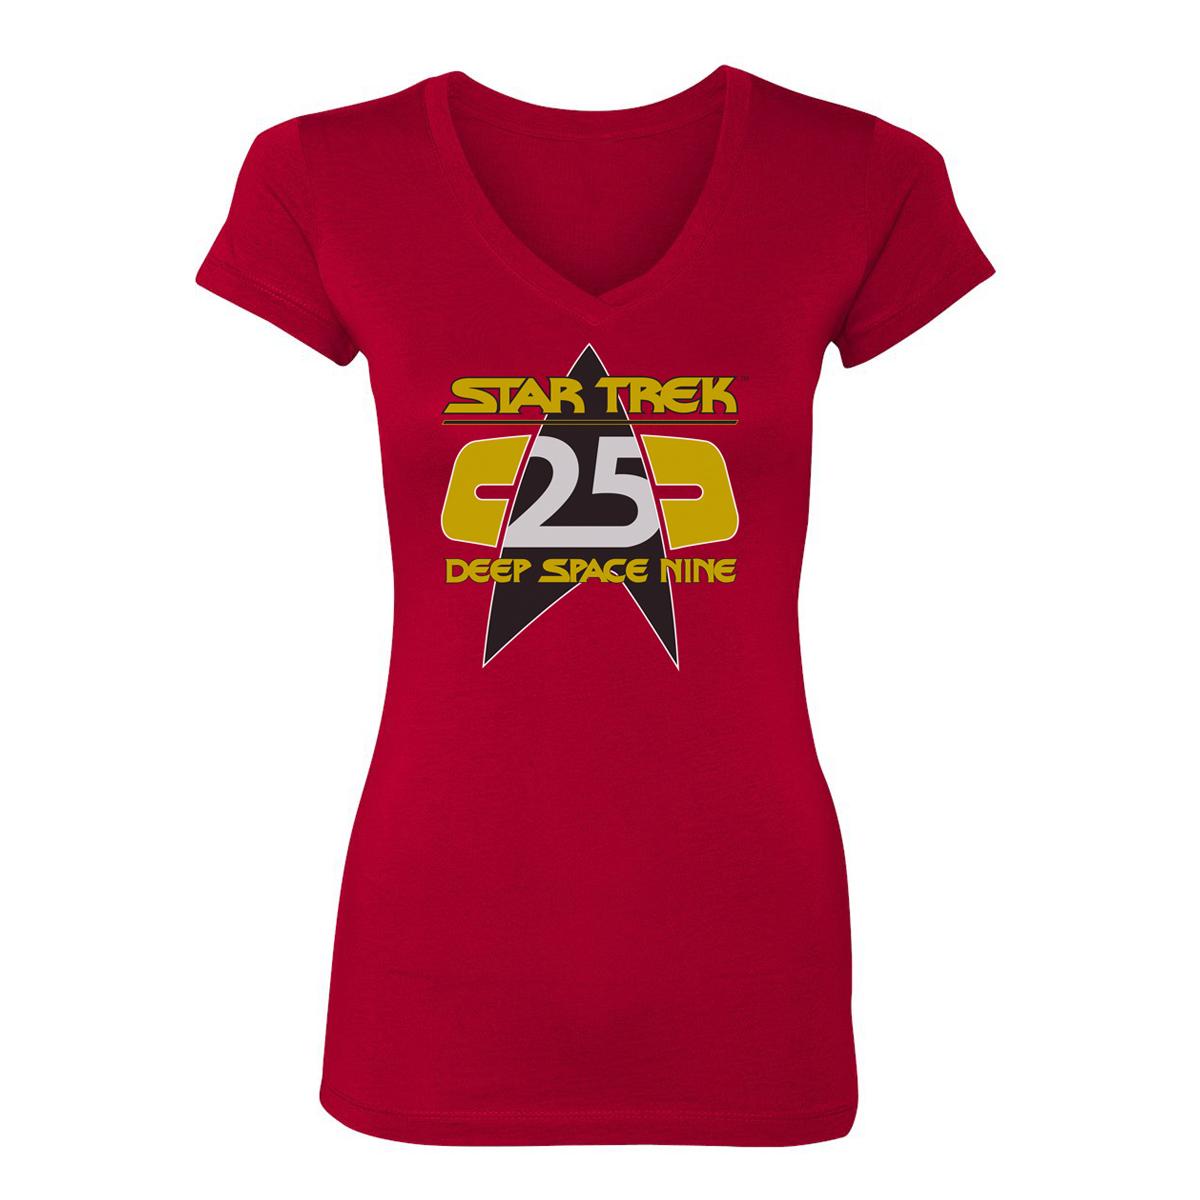 Star Trek Deep Space Nine 25th Anniversary Women's T-Shirt